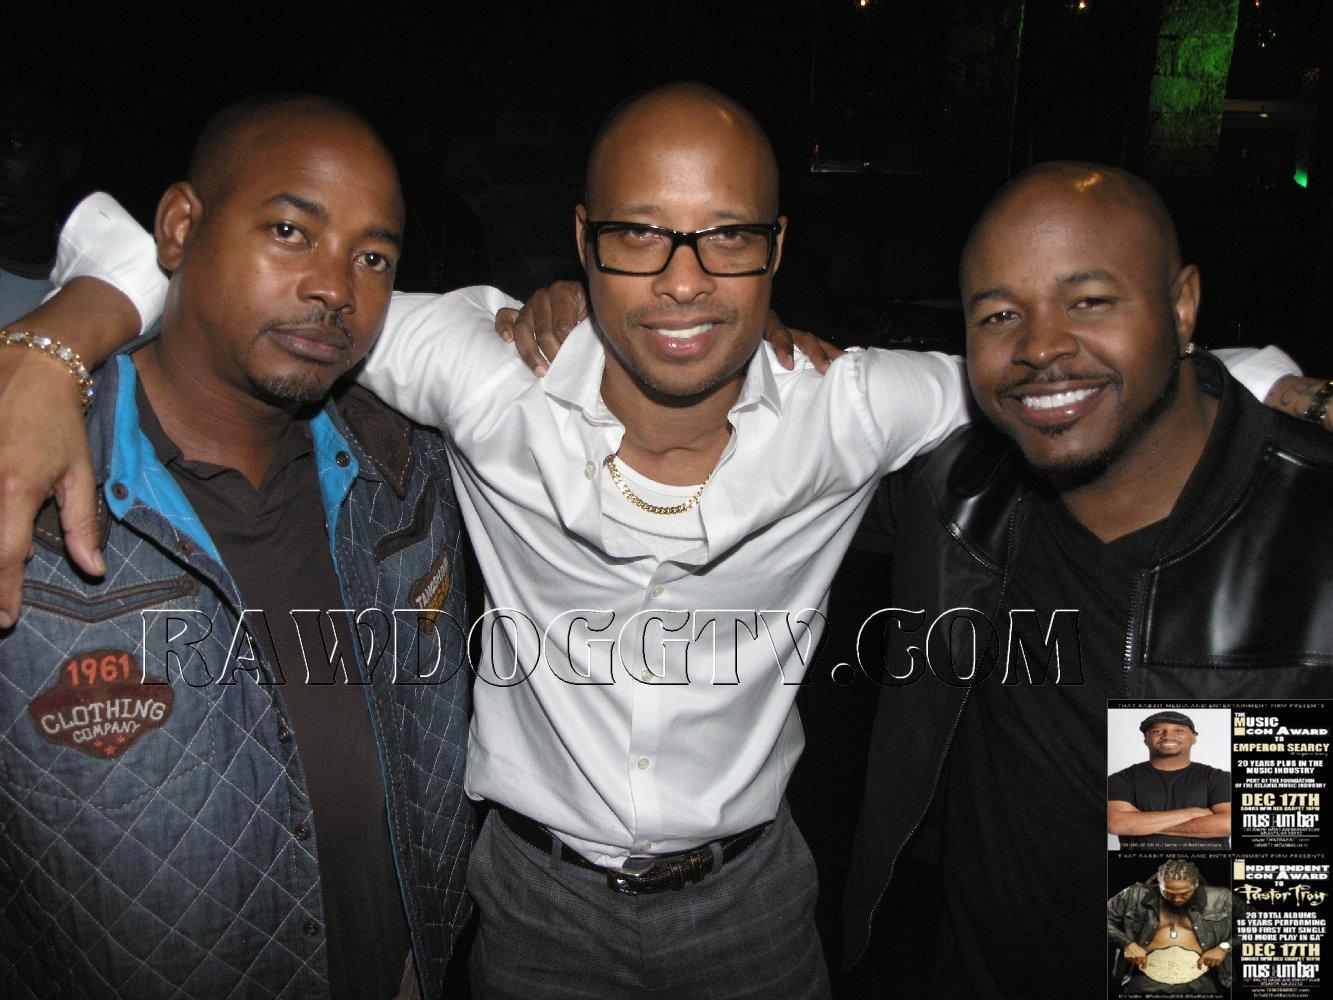 ThatRabbit Magazine Photos-ATL Legends Reunion-The Music Icon Award-Museum Bar Atlanta-Ray Hamilton- dec 17 2015 RAWDOGGTV 305-490-2182 (152)